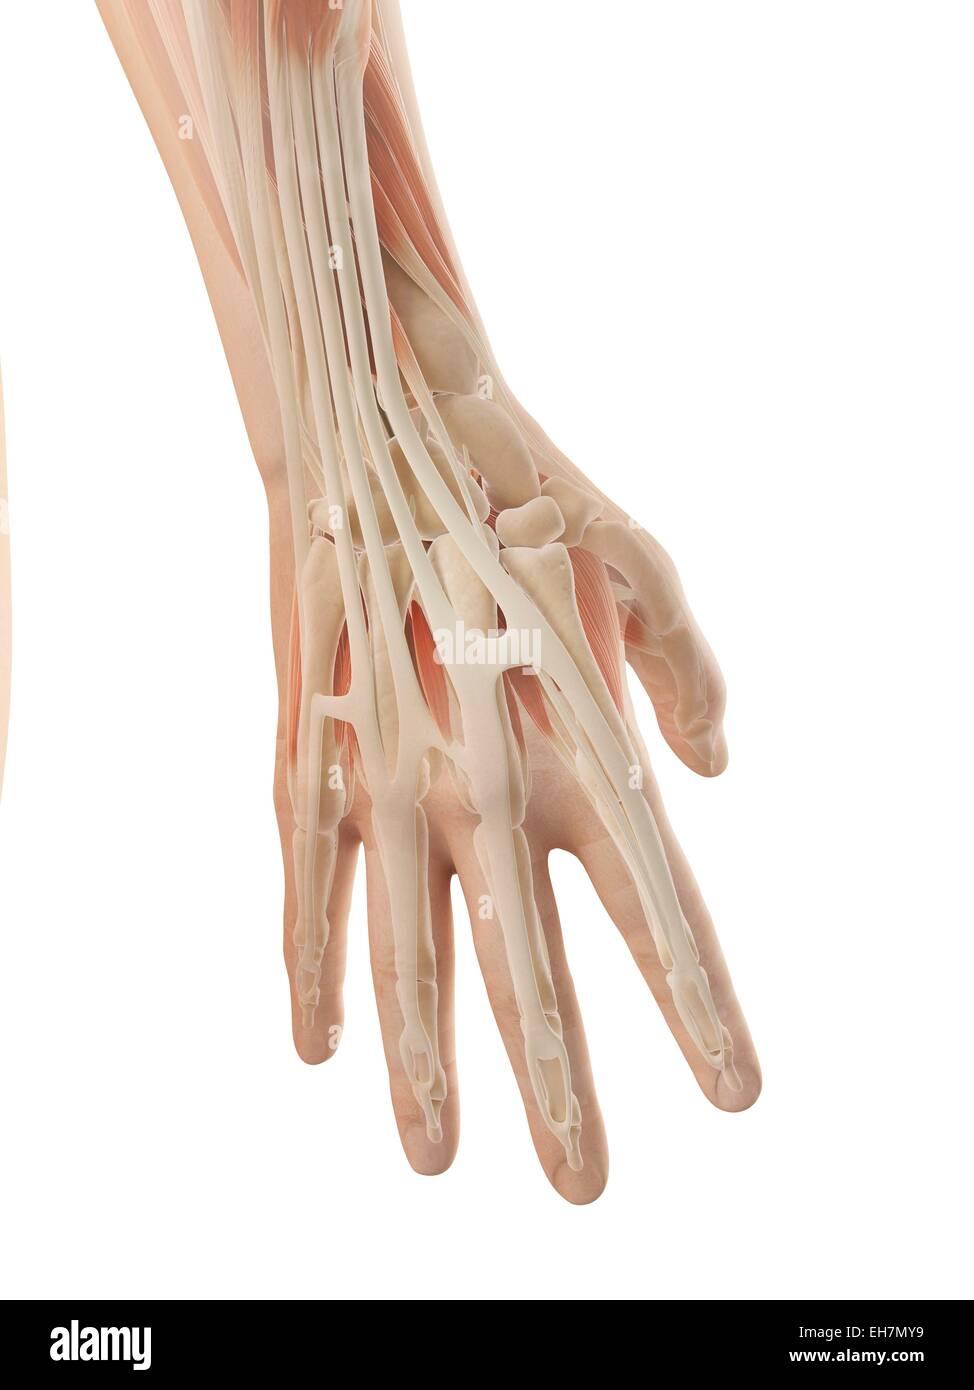 Human Fingers Anatomy Stock Photos Human Fingers Anatomy Stock